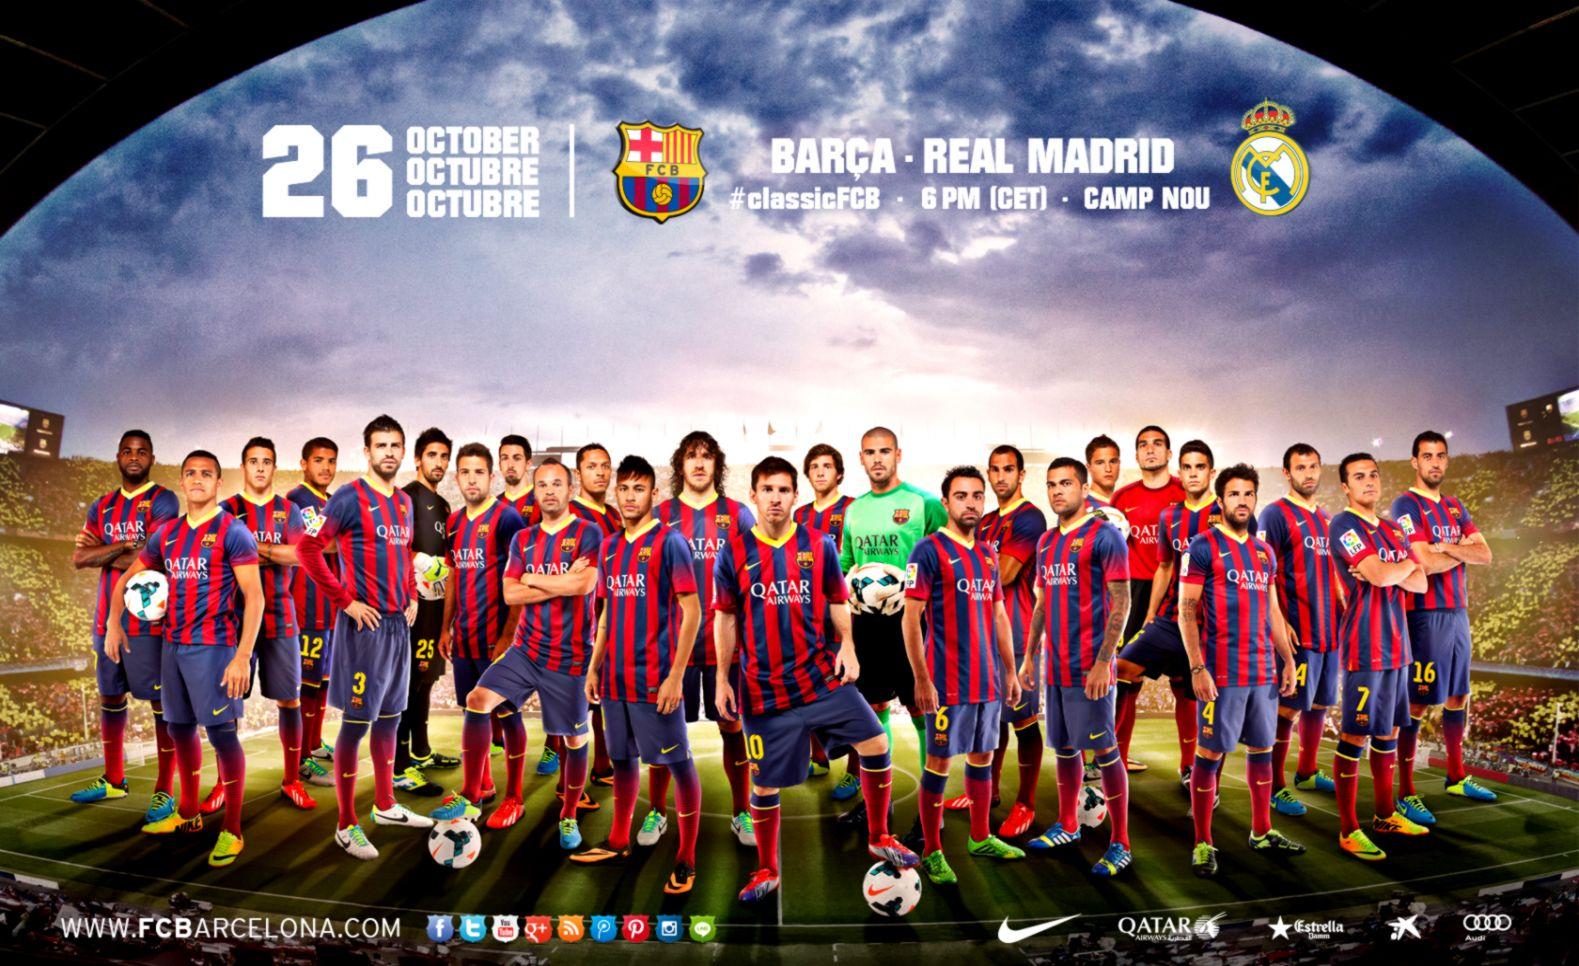 Fc Barcelona 2013 Wallpaper Wallpapers Sheet